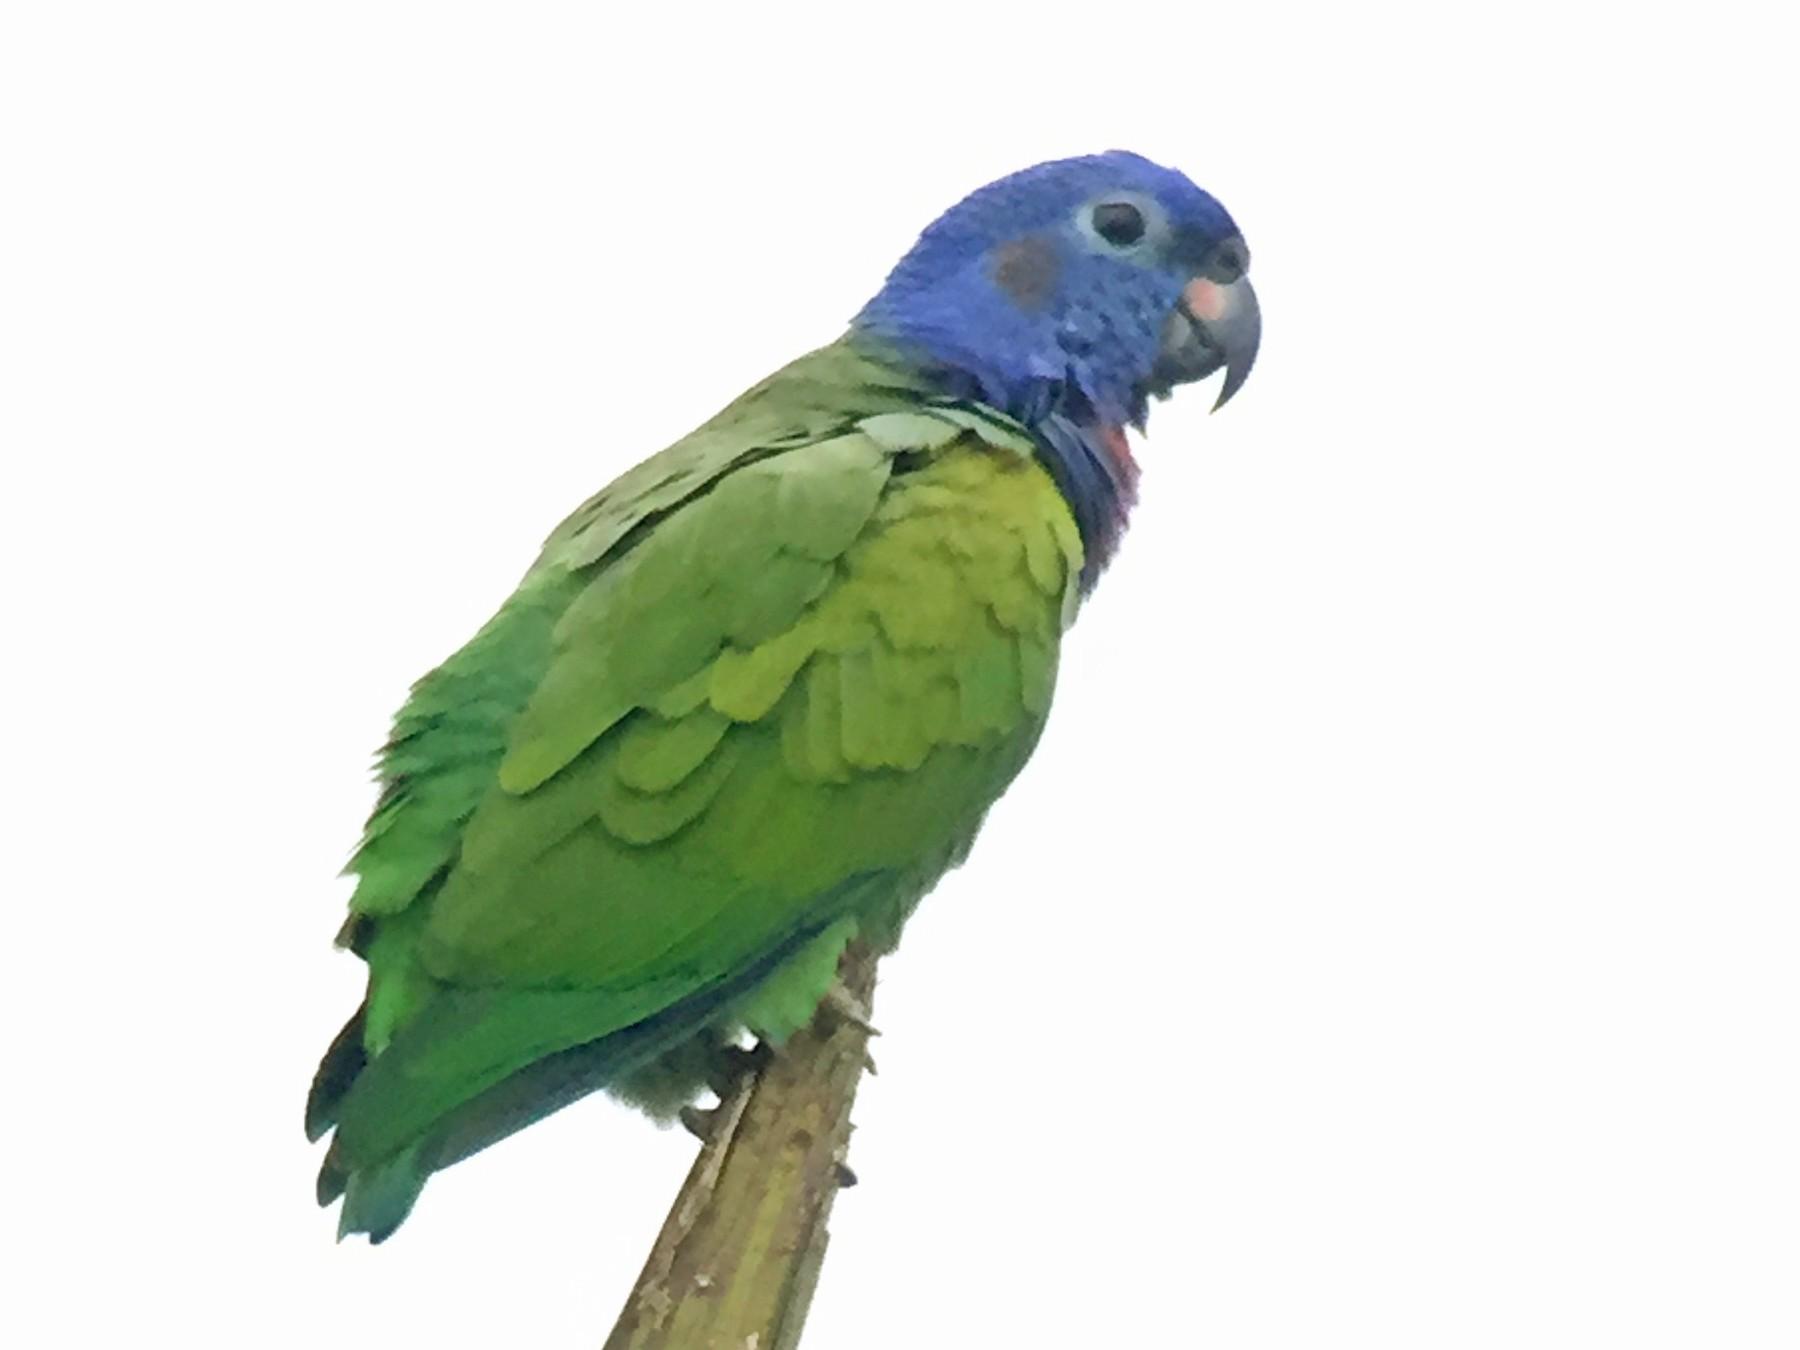 Blue-headed Parrot - javier arias villota